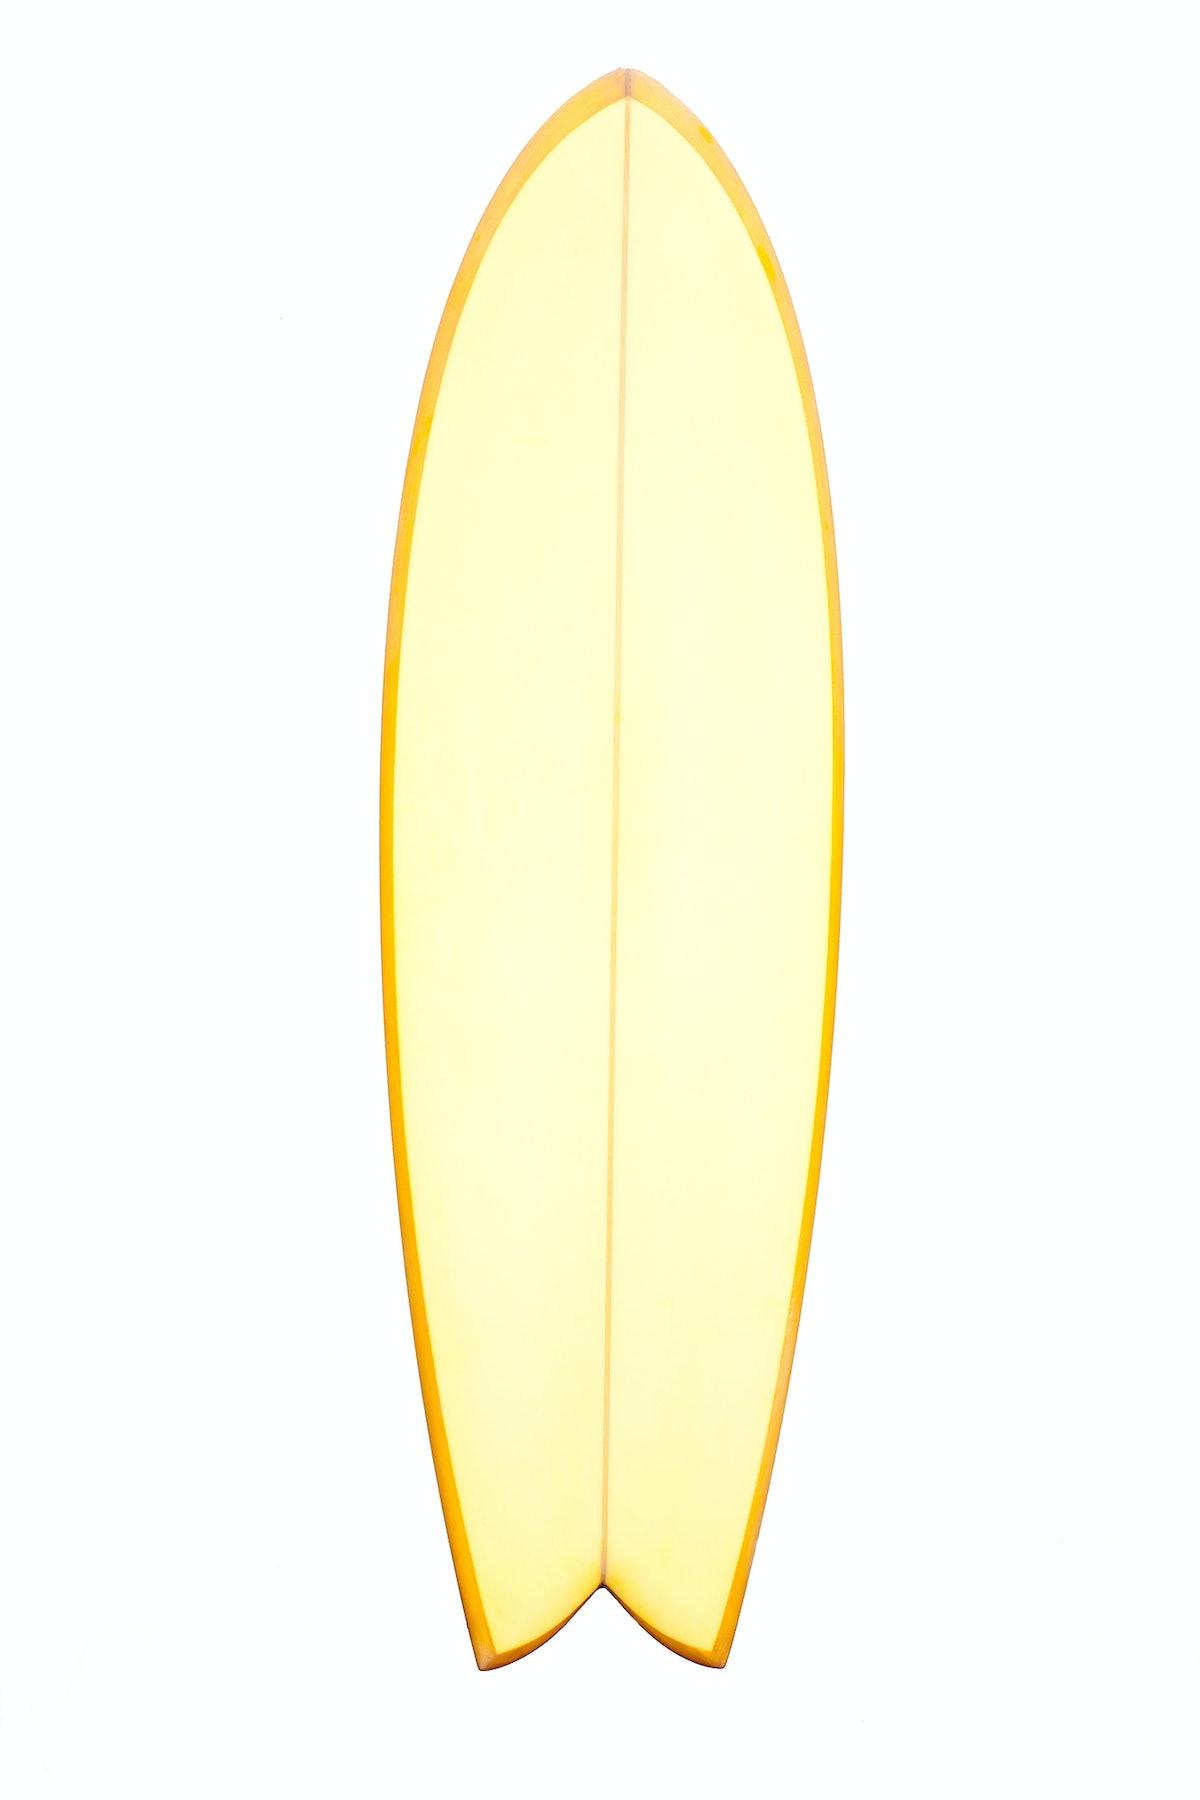 Tudor Surfboards surfboard